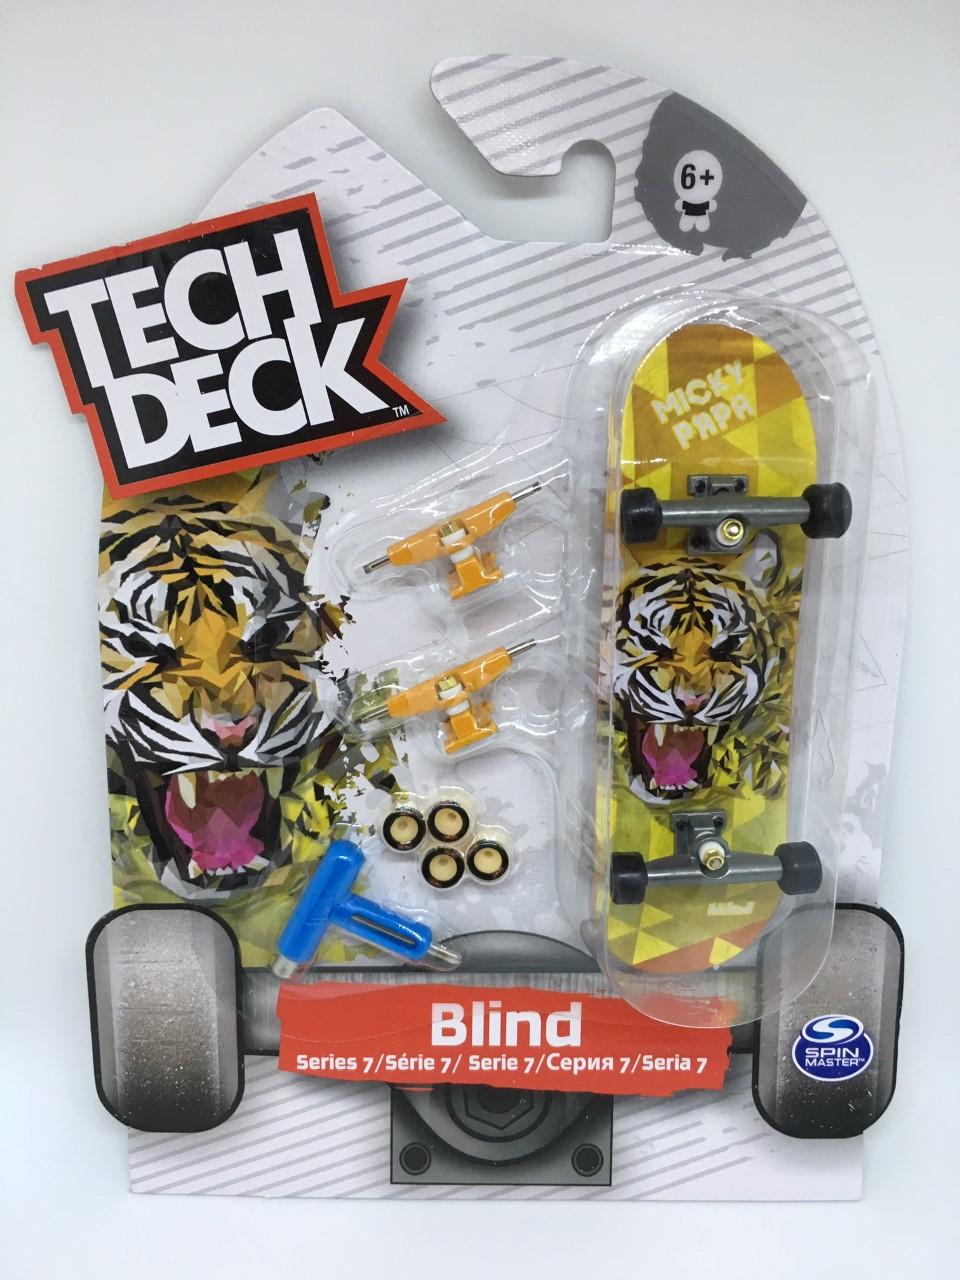 Tech Deck Series 7 Blind Micky Papa Freedayshop